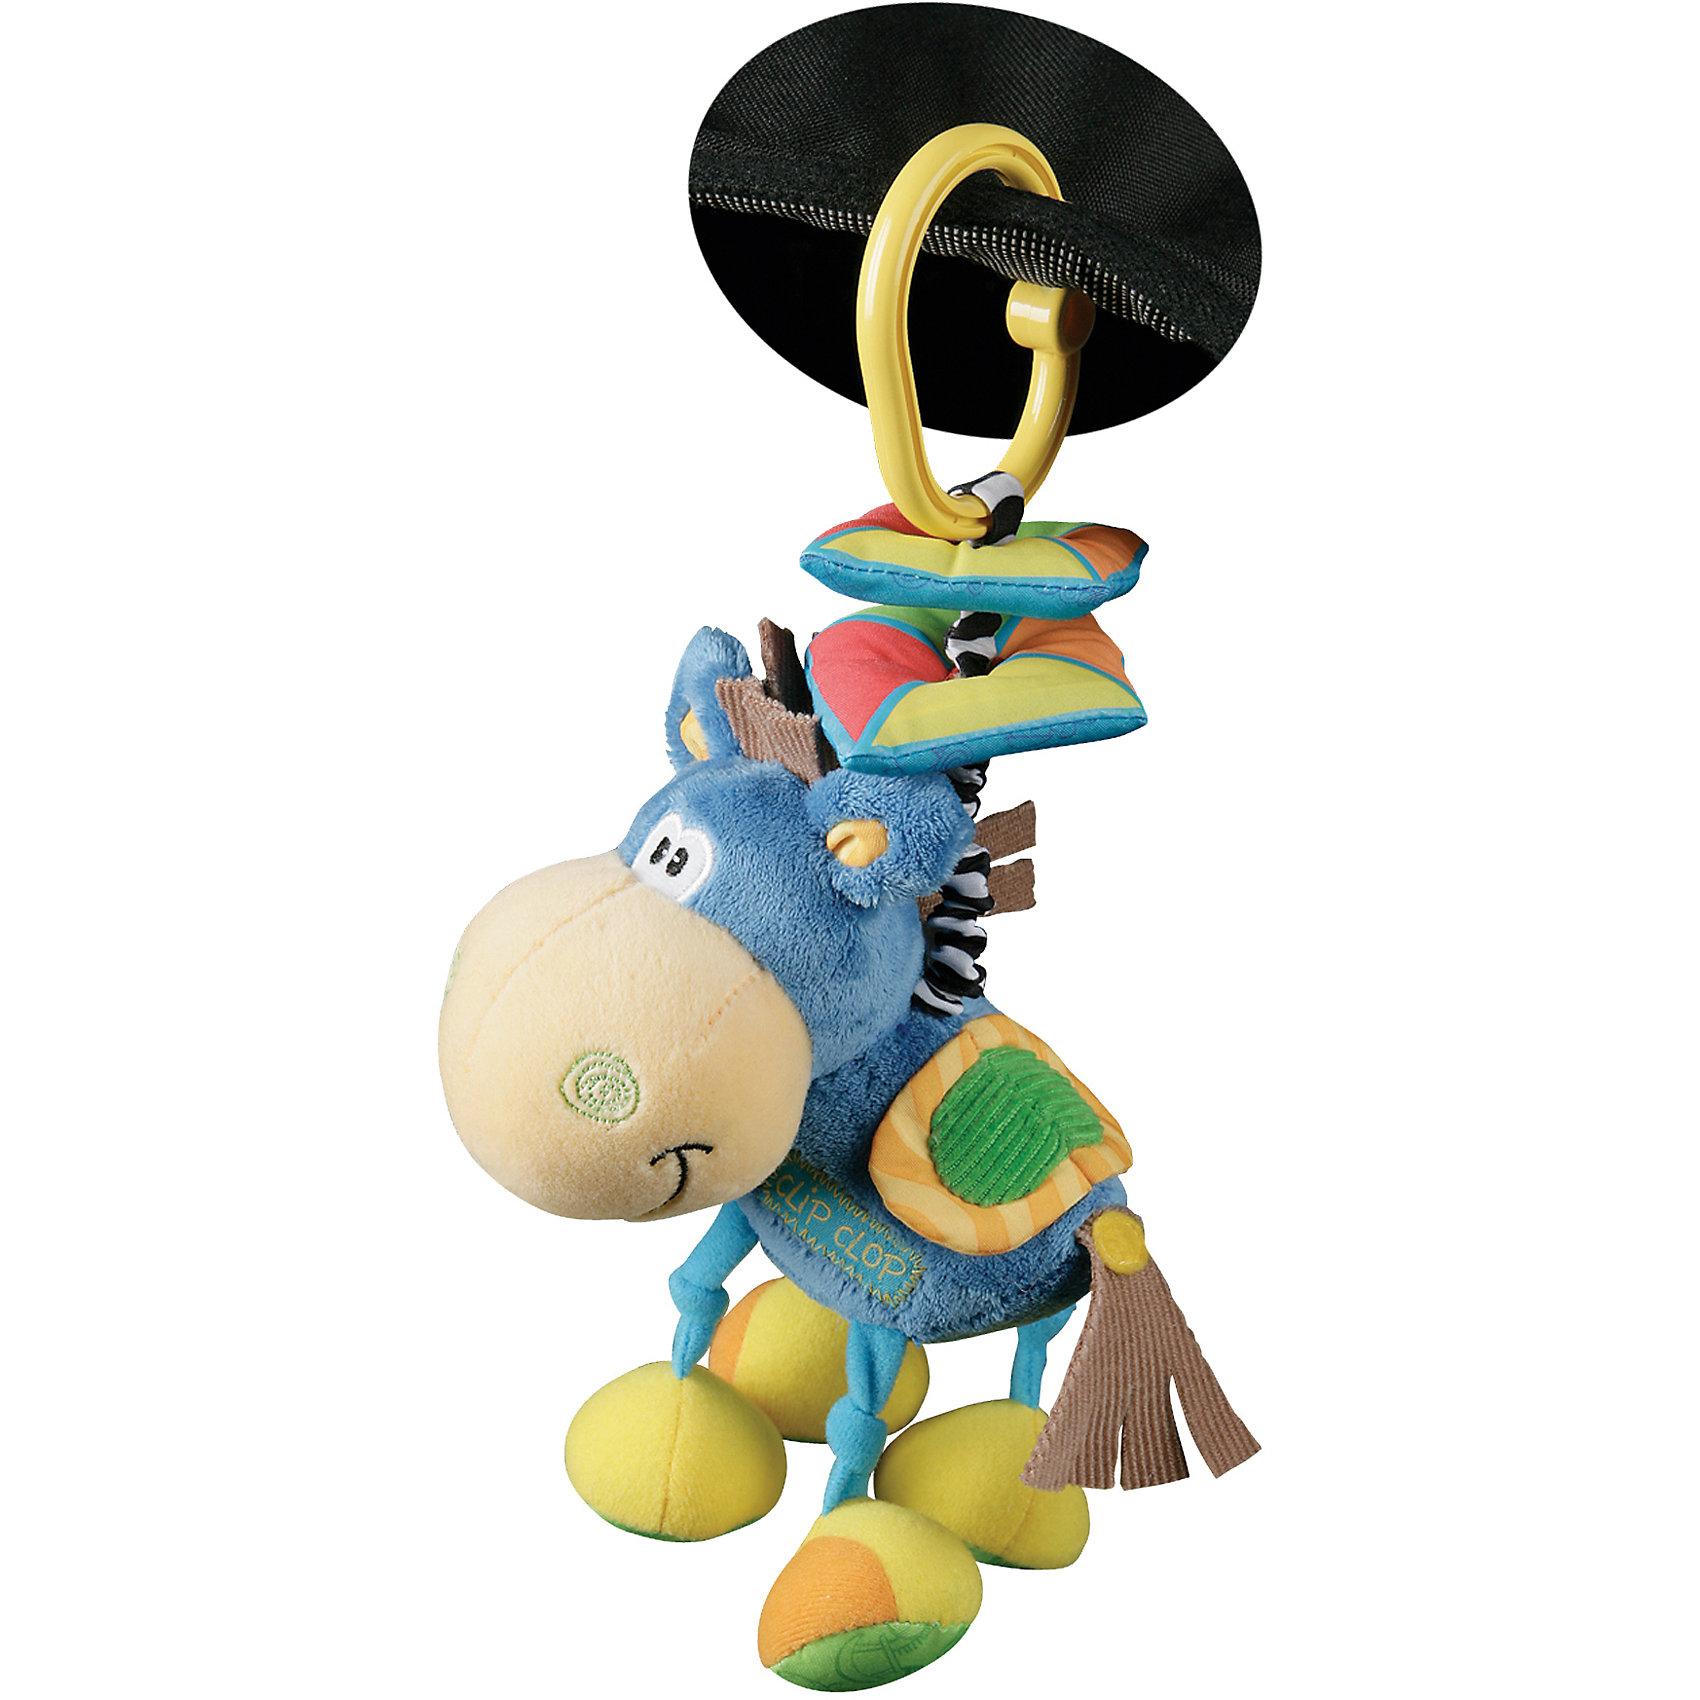 Playgro Мягкая игрушка-подвеска Ослик playgro мягкая игрушка щенок